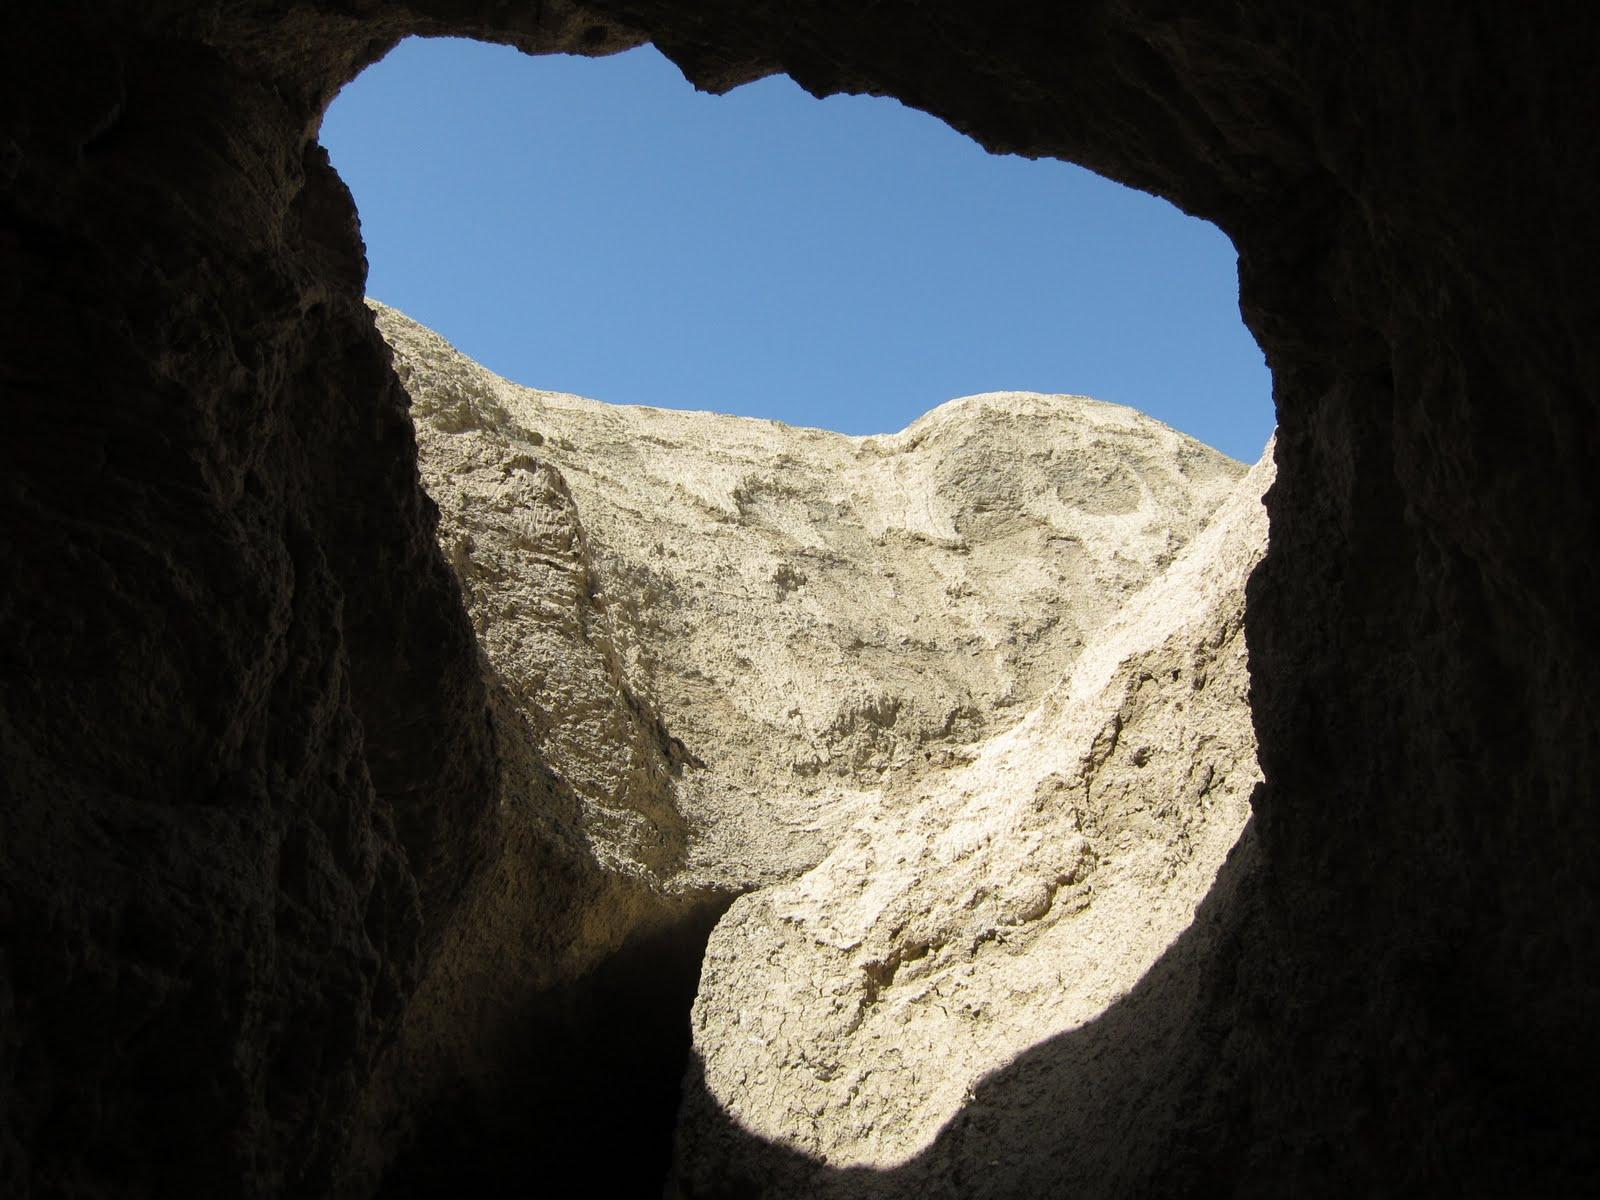 Blue desert sky above the large slot canyon